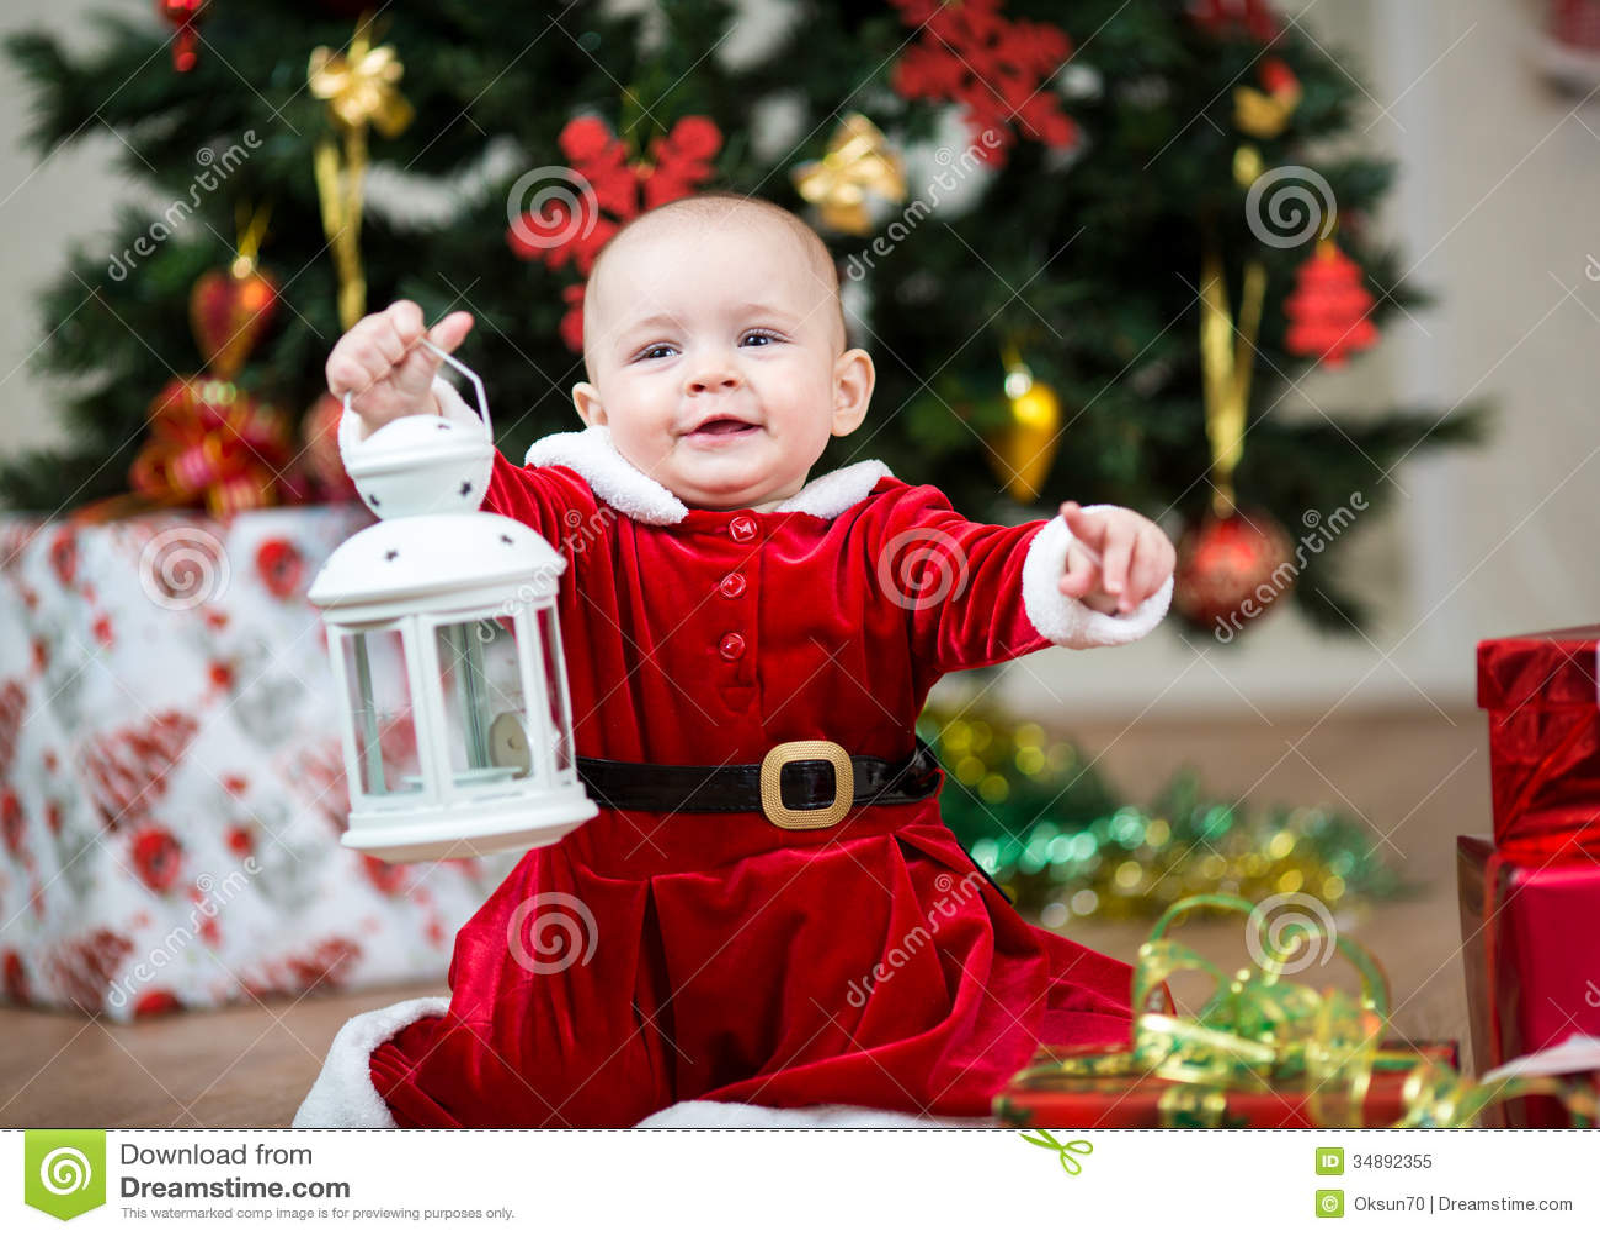 Baby Girl Dressed As Santa Claus At Christmas Tree Royalty Free ...